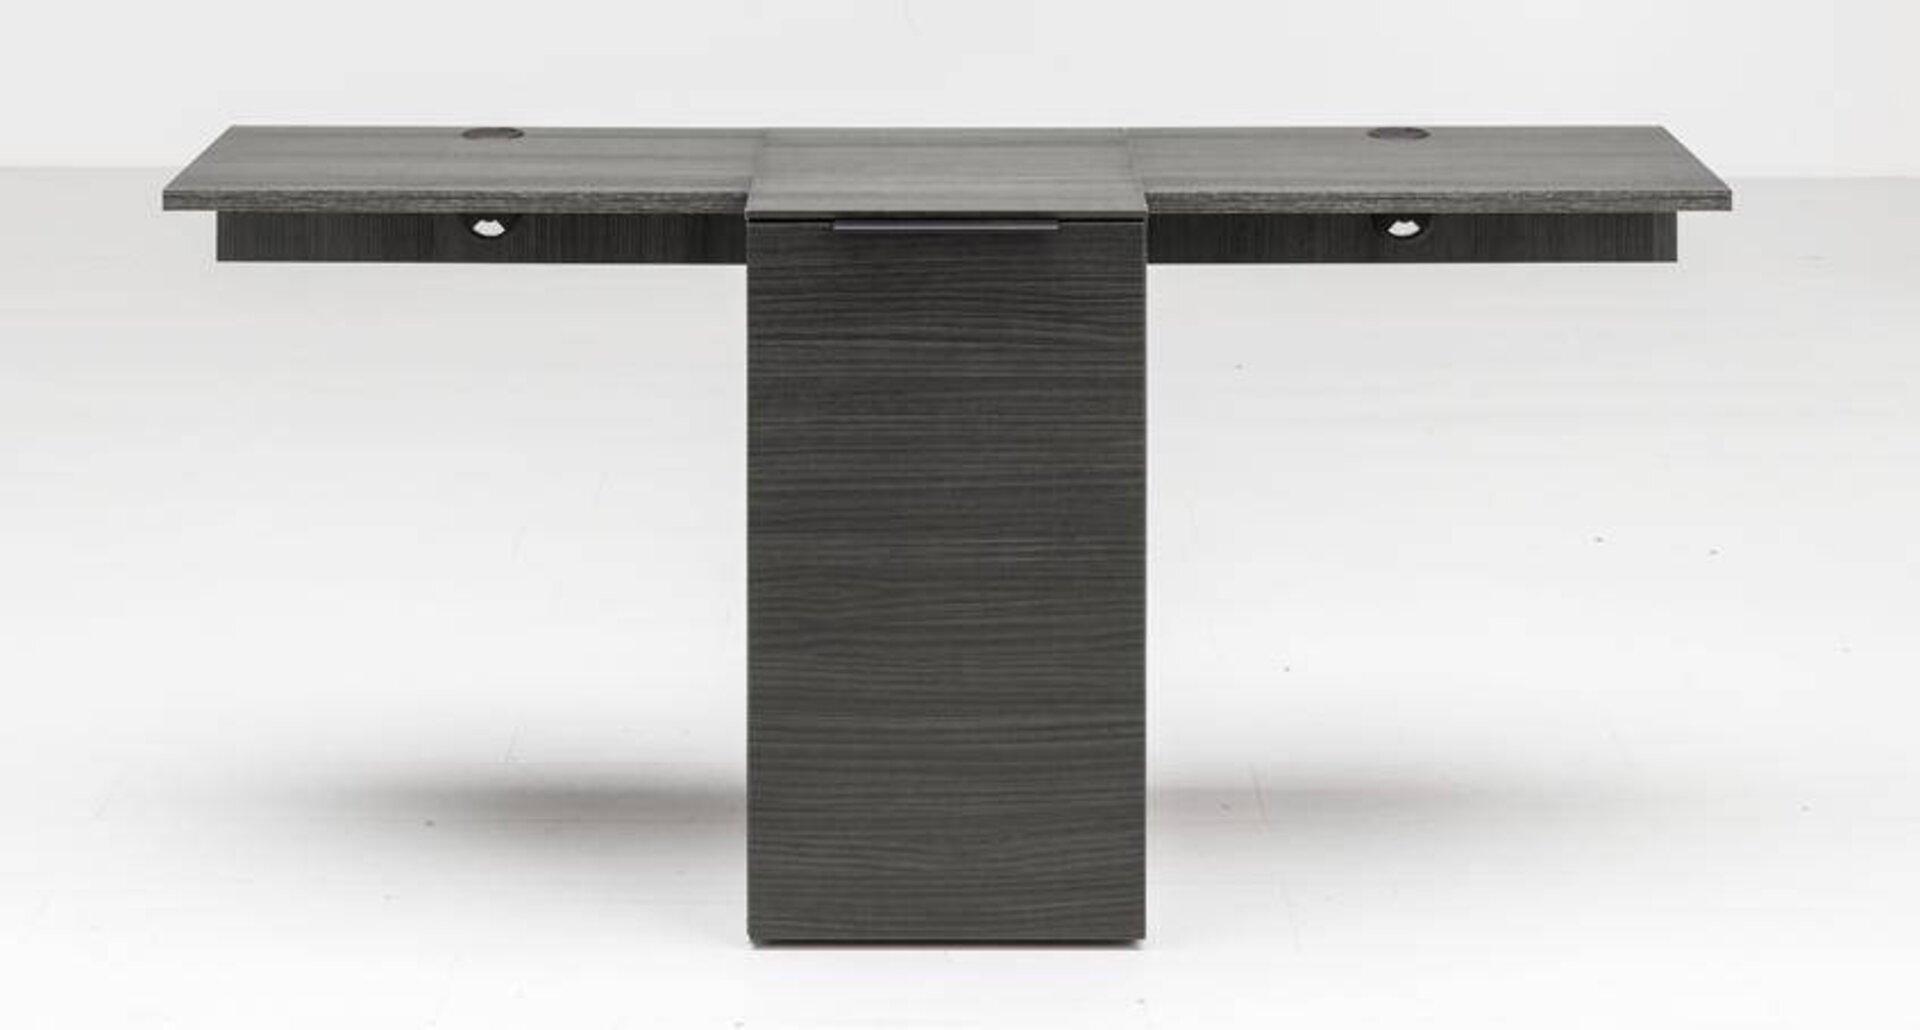 Lowboard MENDOZA106 LIV'IN Holzwerkstoff mehrfarbig 51 x 76 x 160 cm